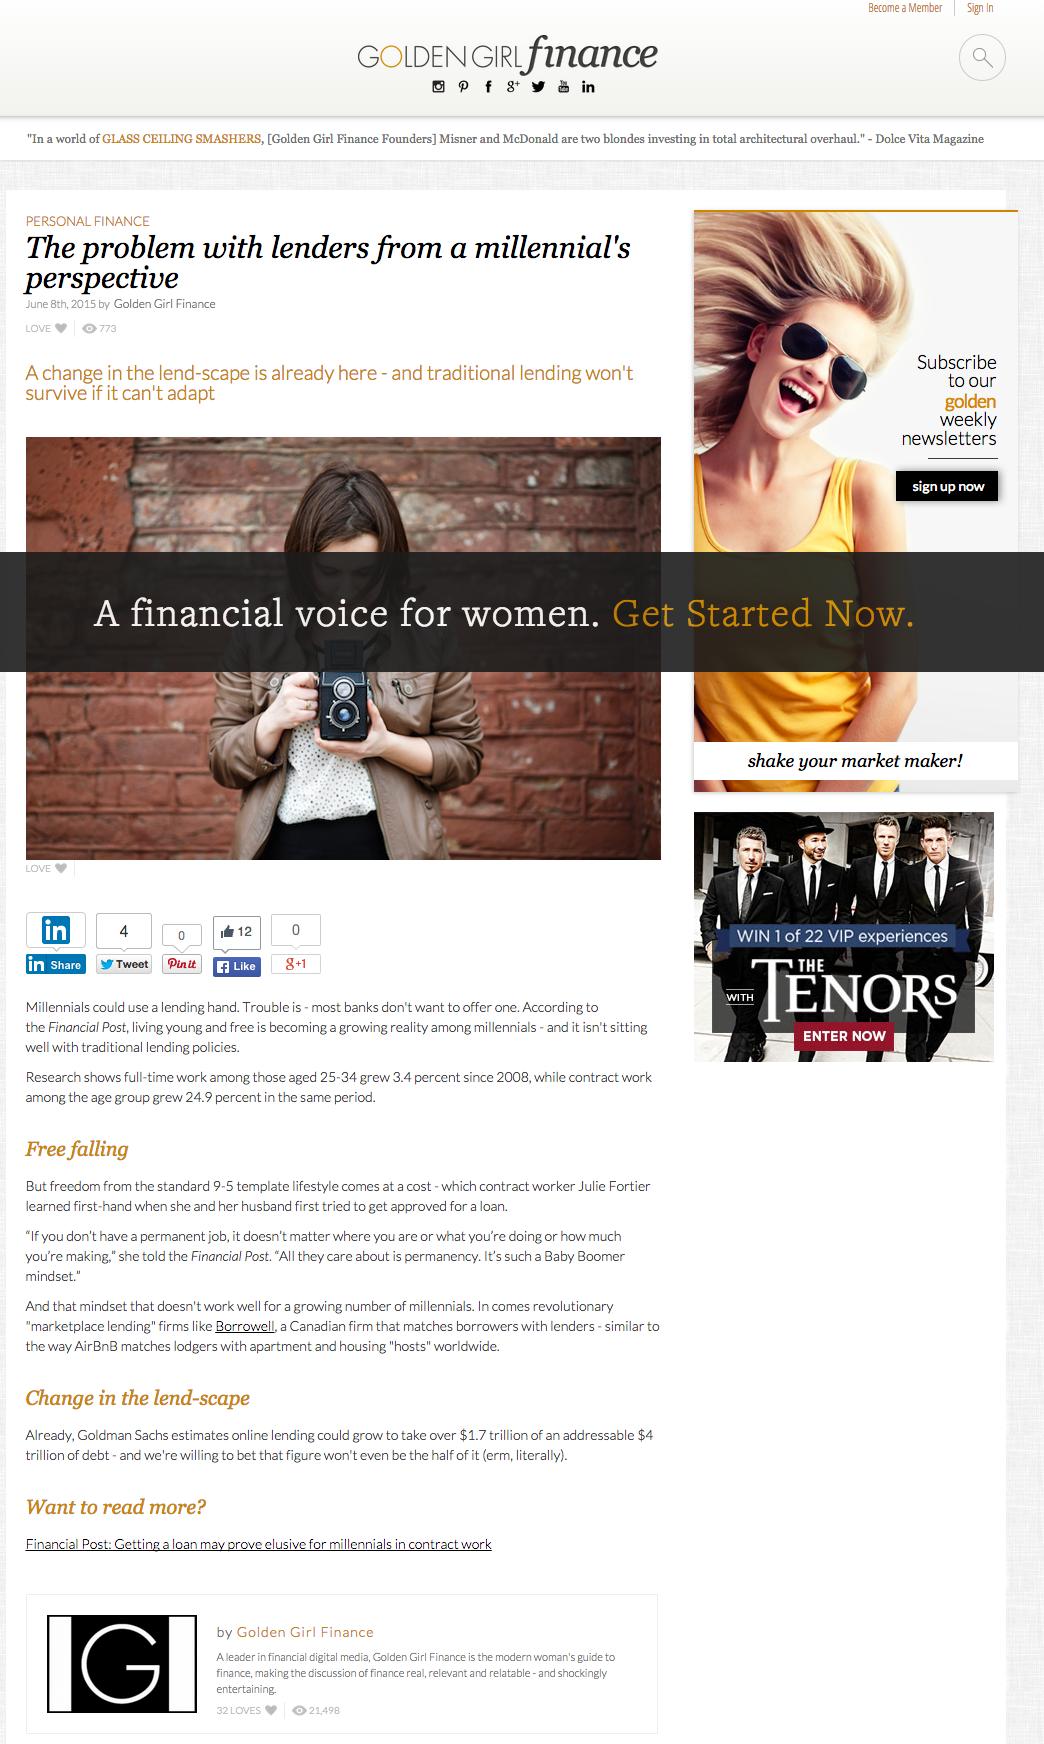 Golden Girl Finances covers Borrowell